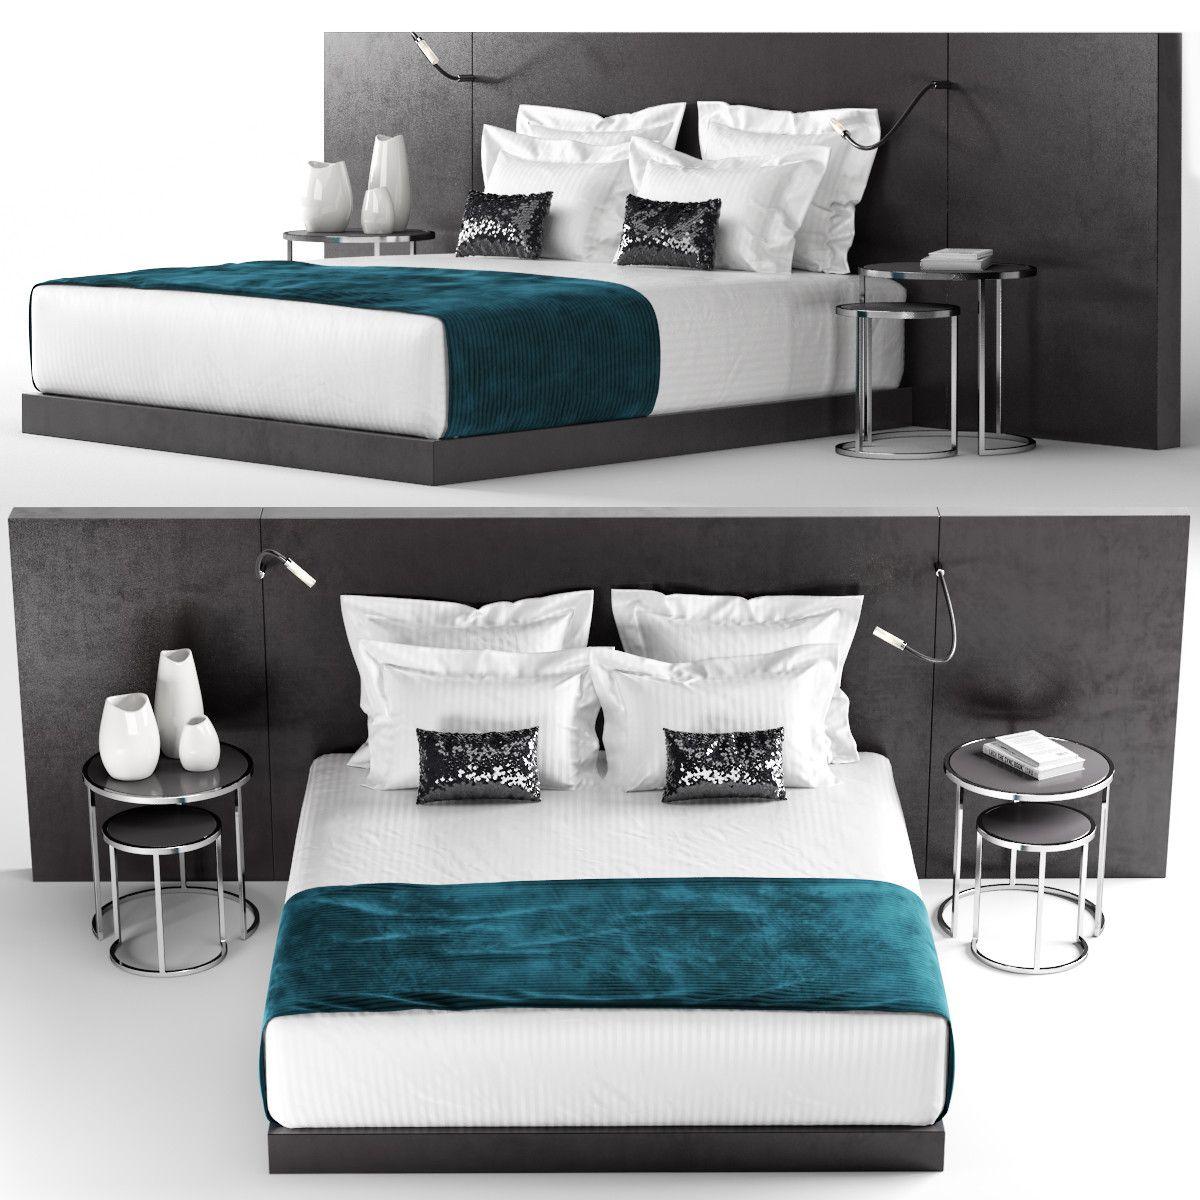 3d hotel bedding lamps 3d model 3d modeling pinterest 3d